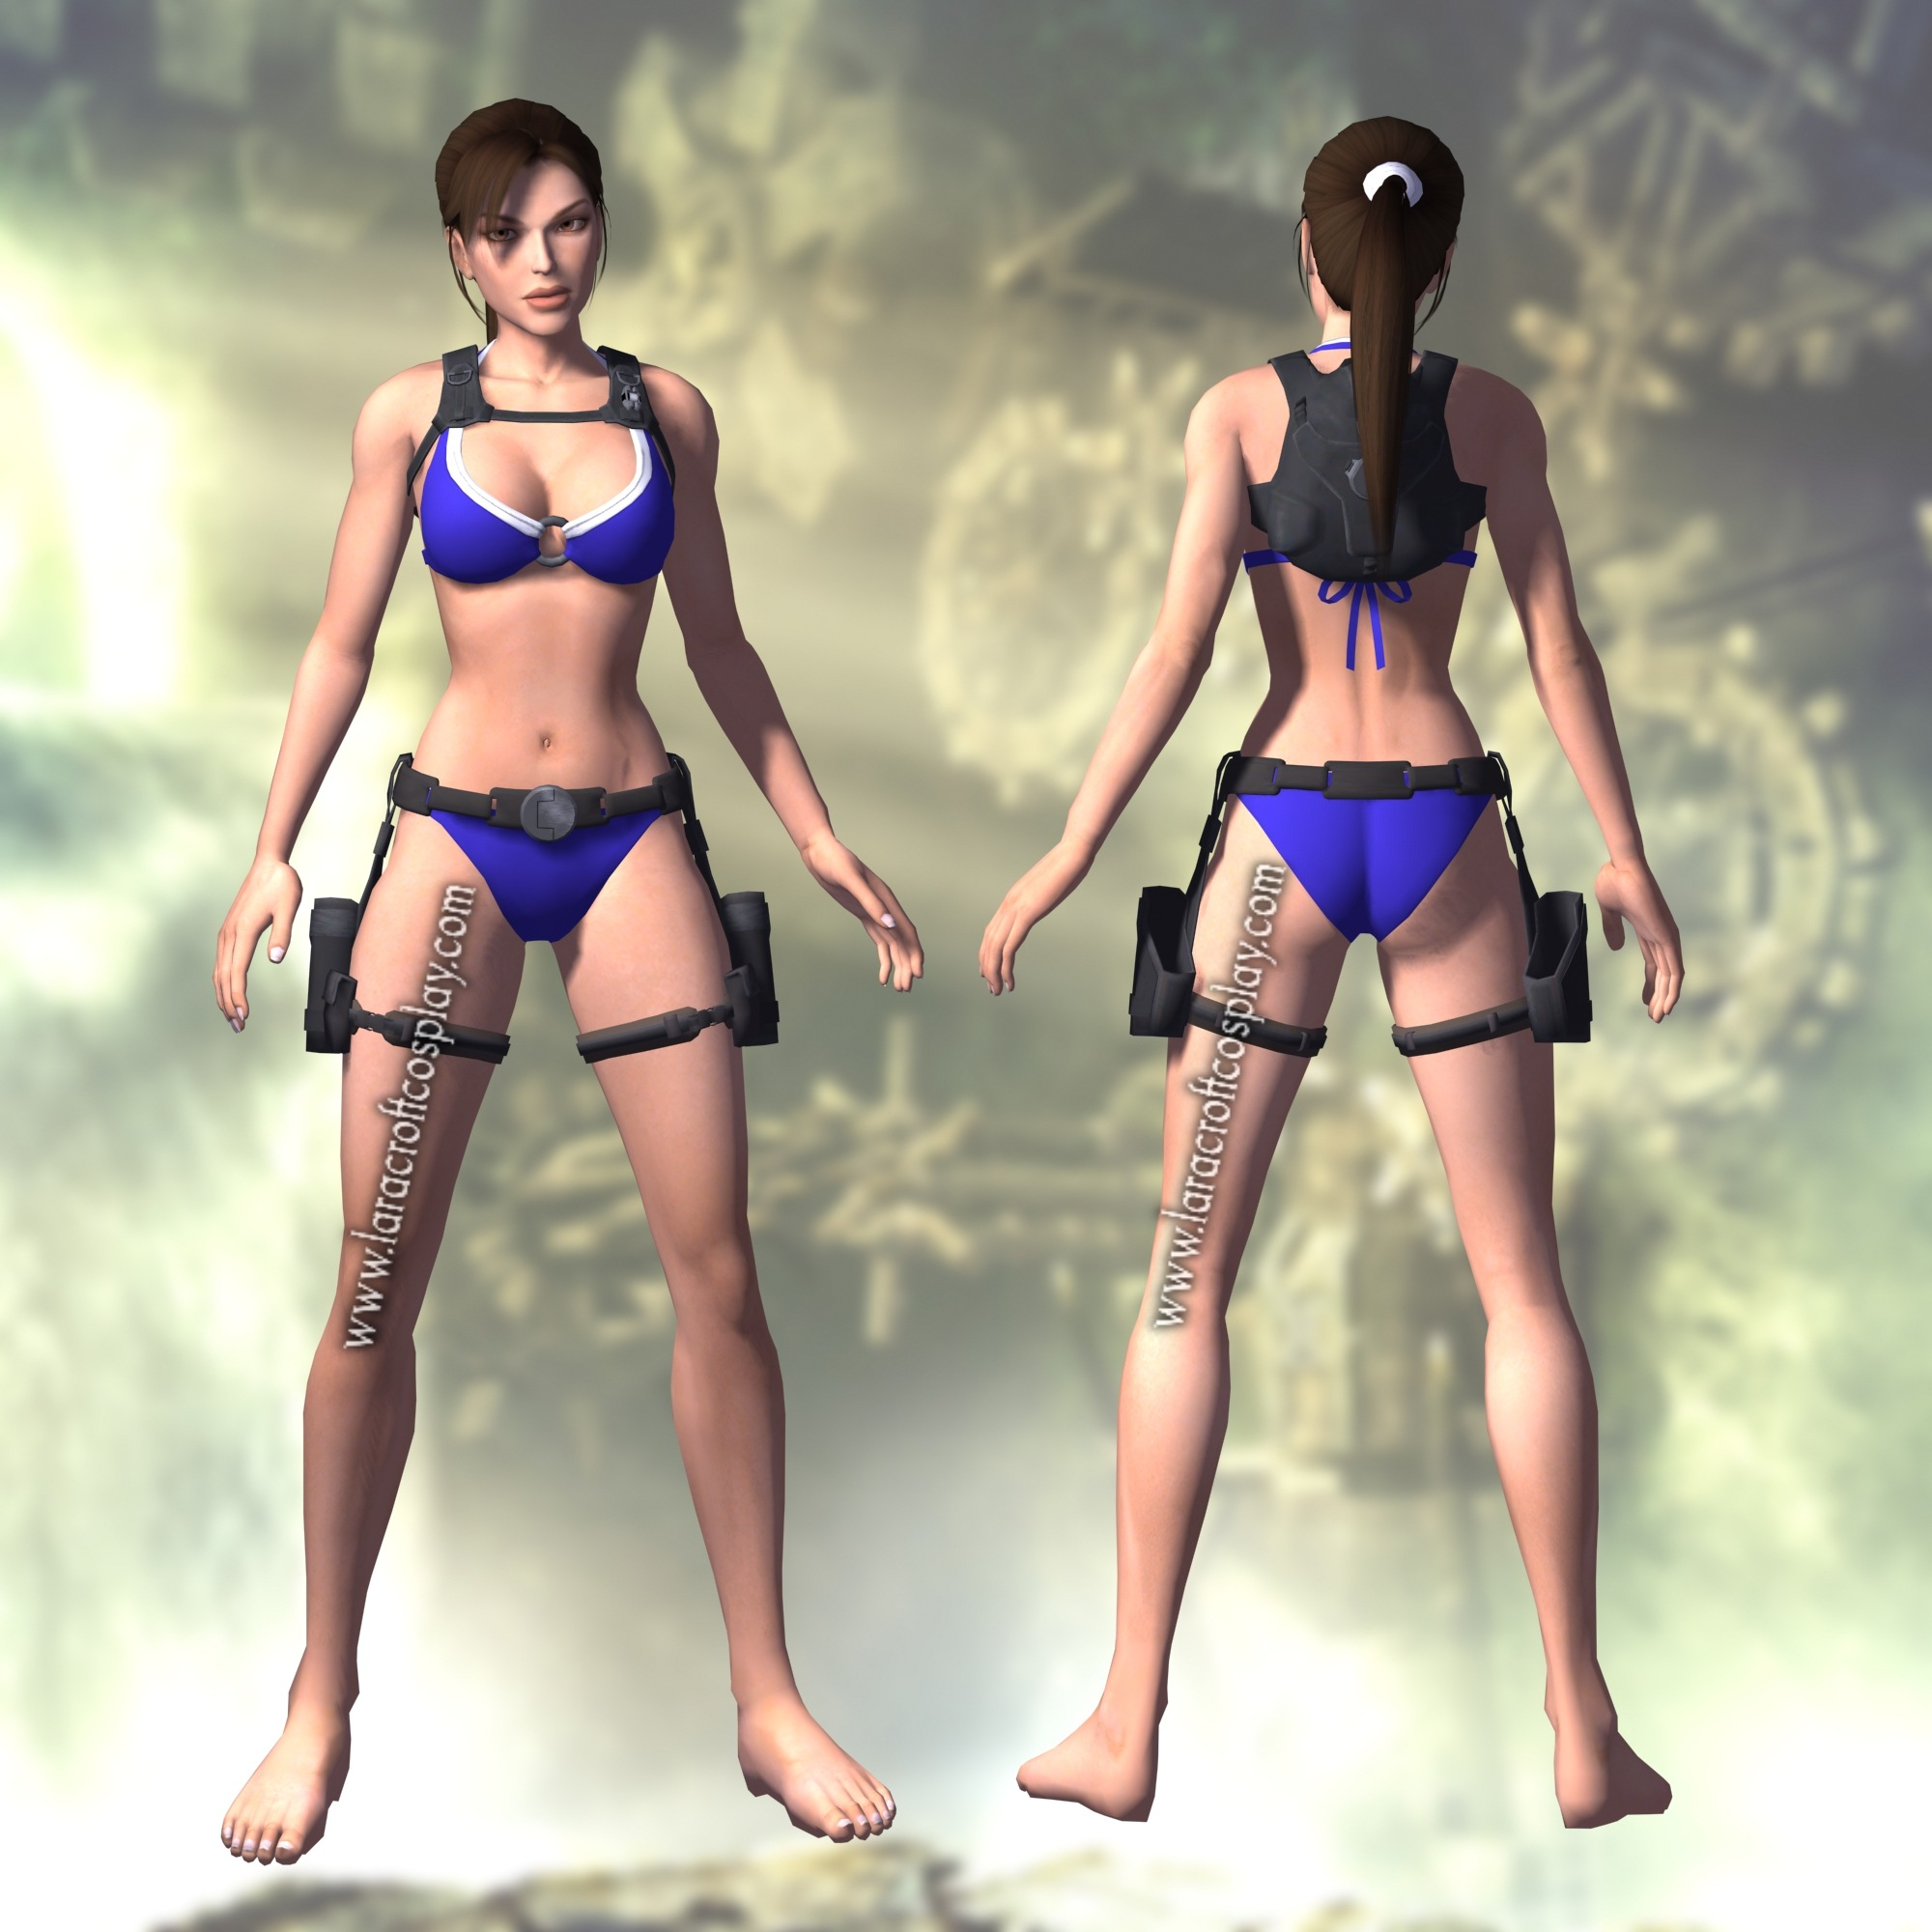 Lara croft underworld bikini breasts erotic download